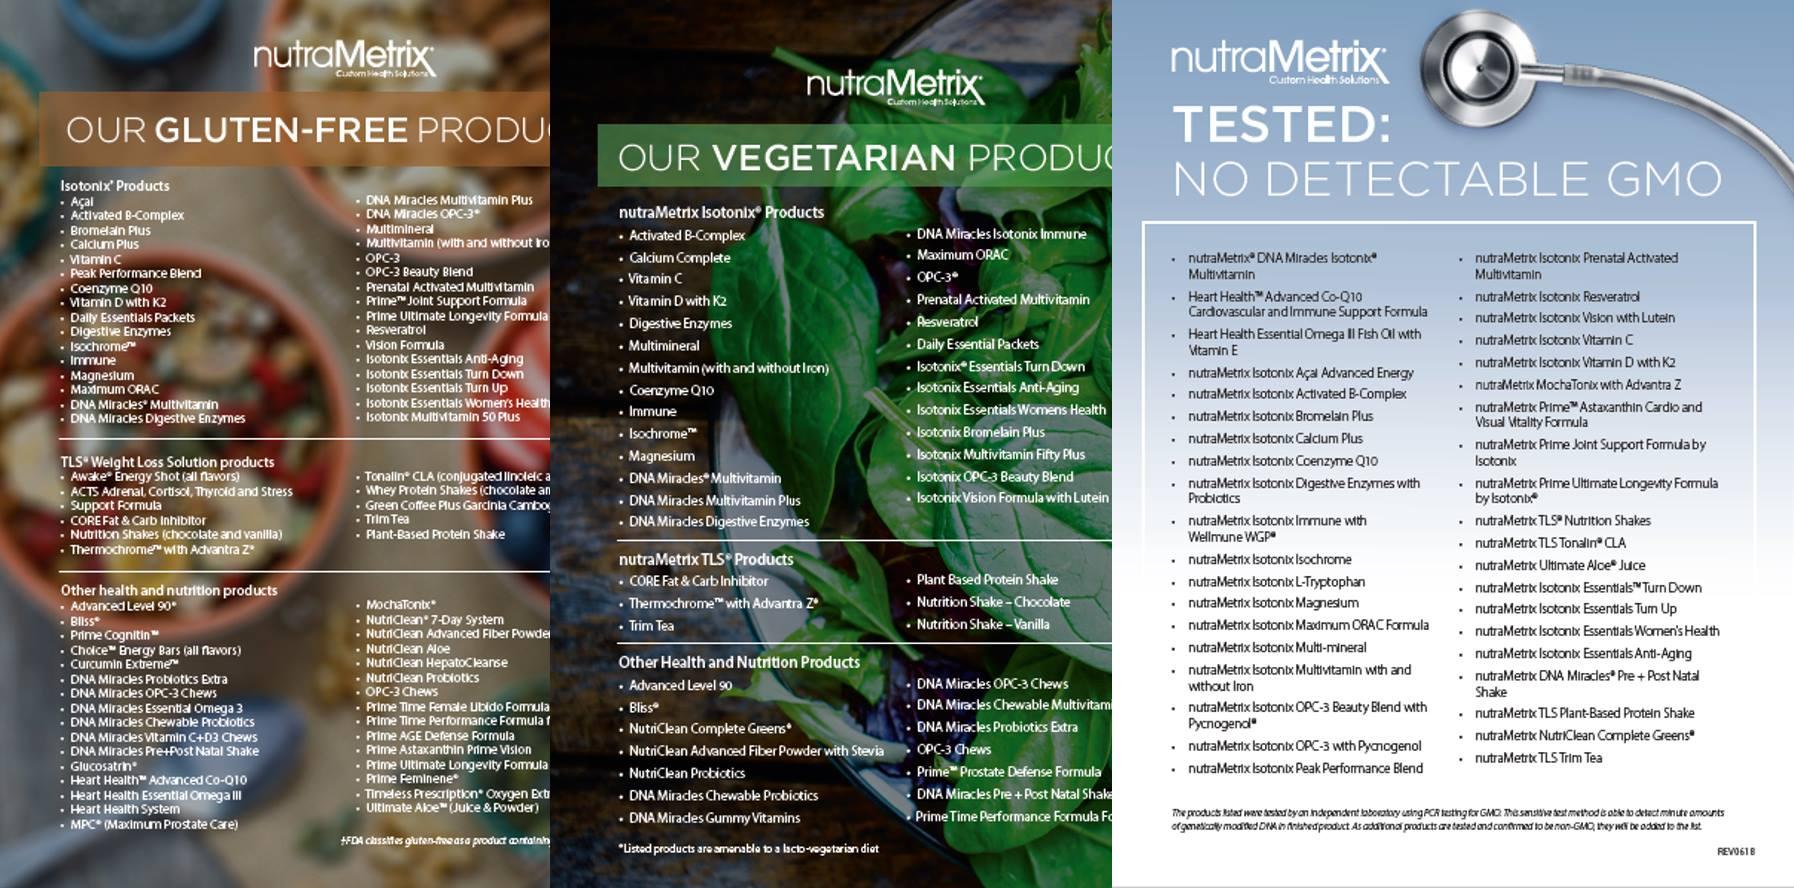 non gmo, vegetarian and gluten-free.jpg